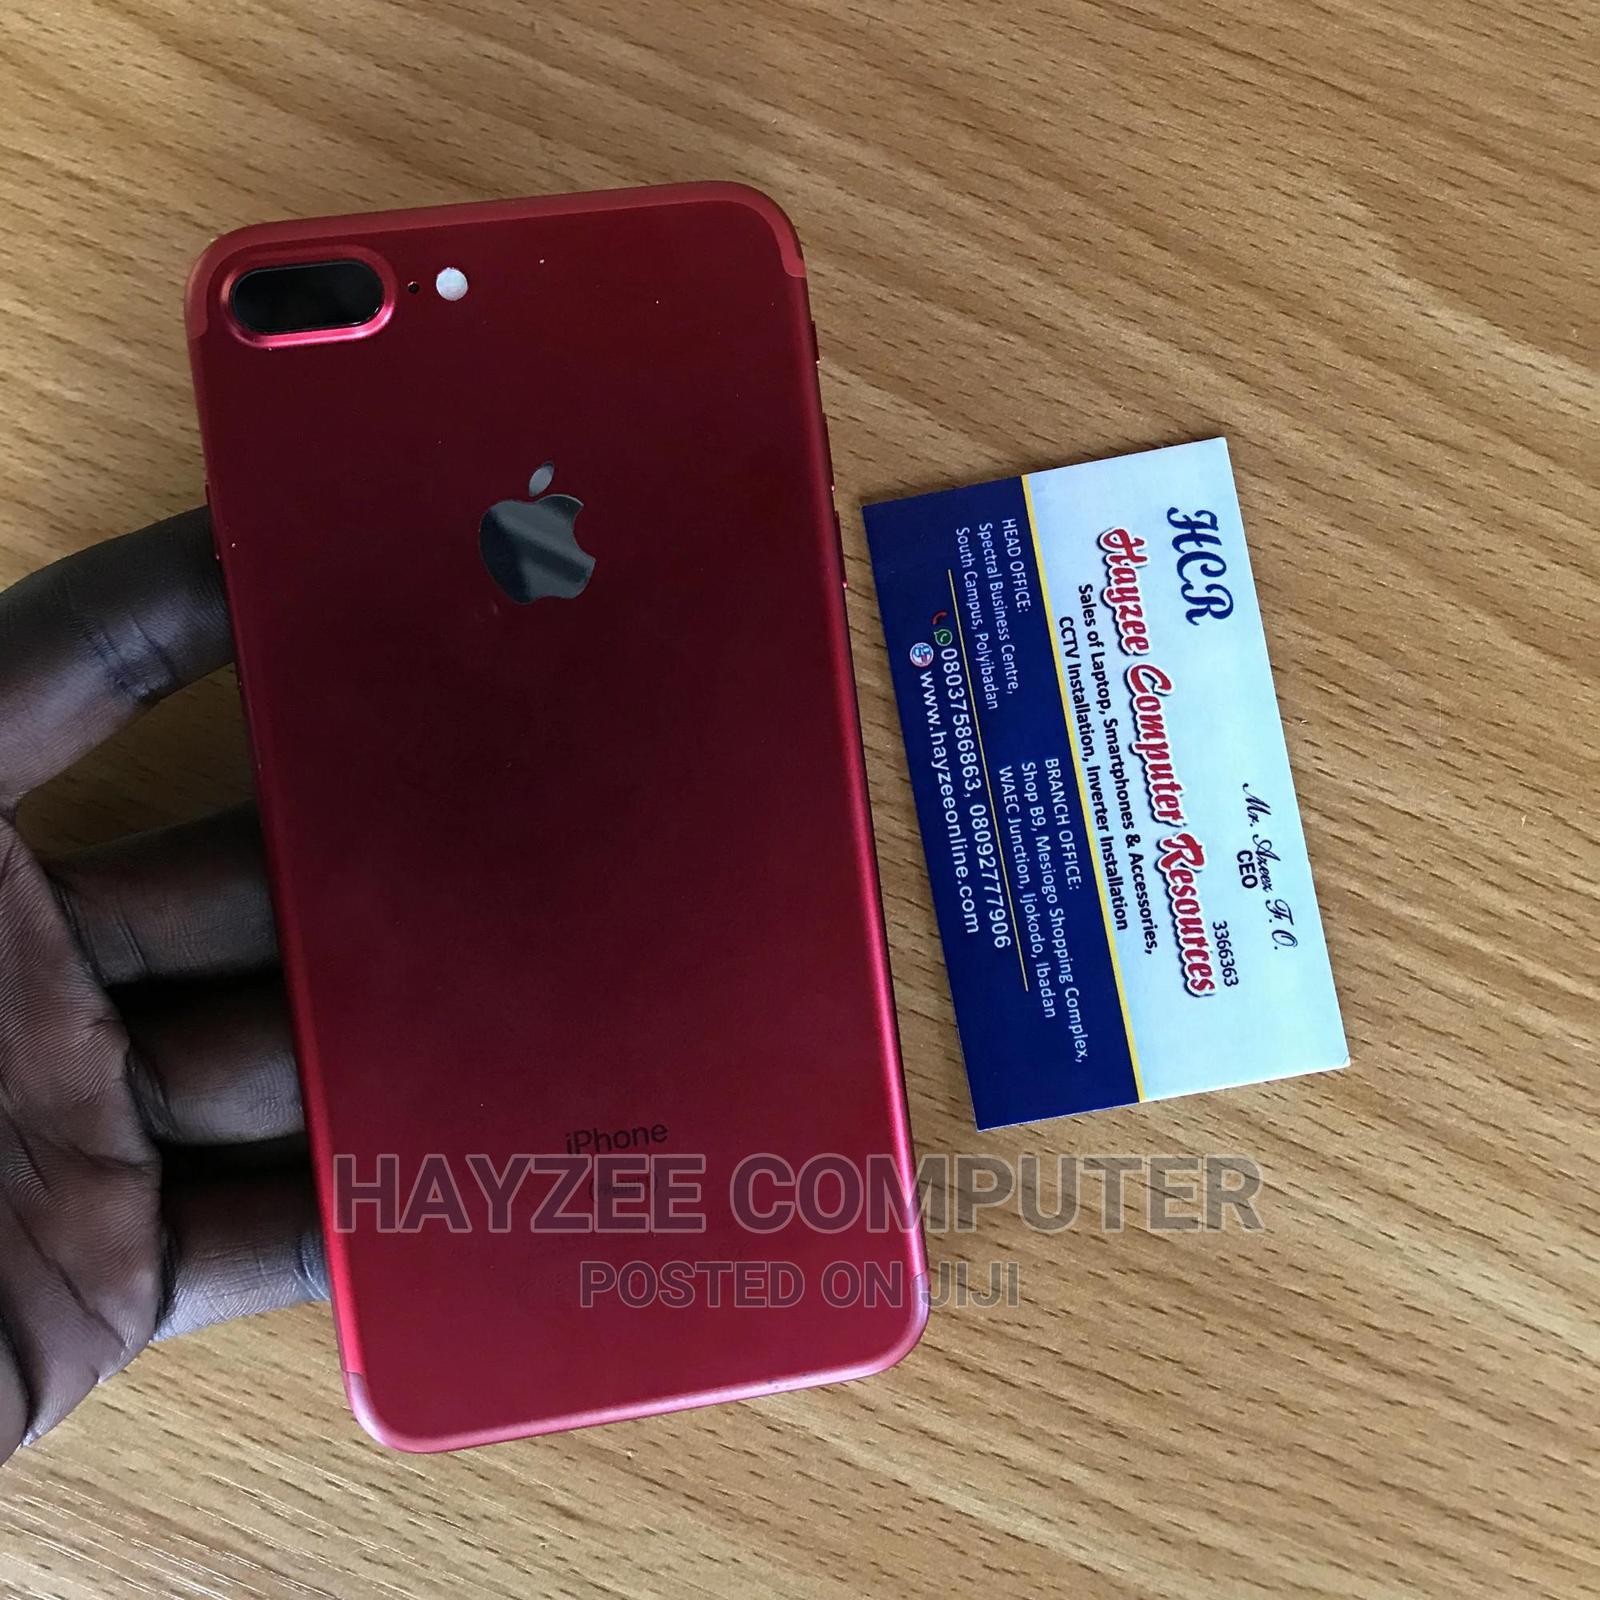 Apple iPhone 7 Plus 32 GB Red   Mobile Phones for sale in Ibadan, Oyo State, Nigeria